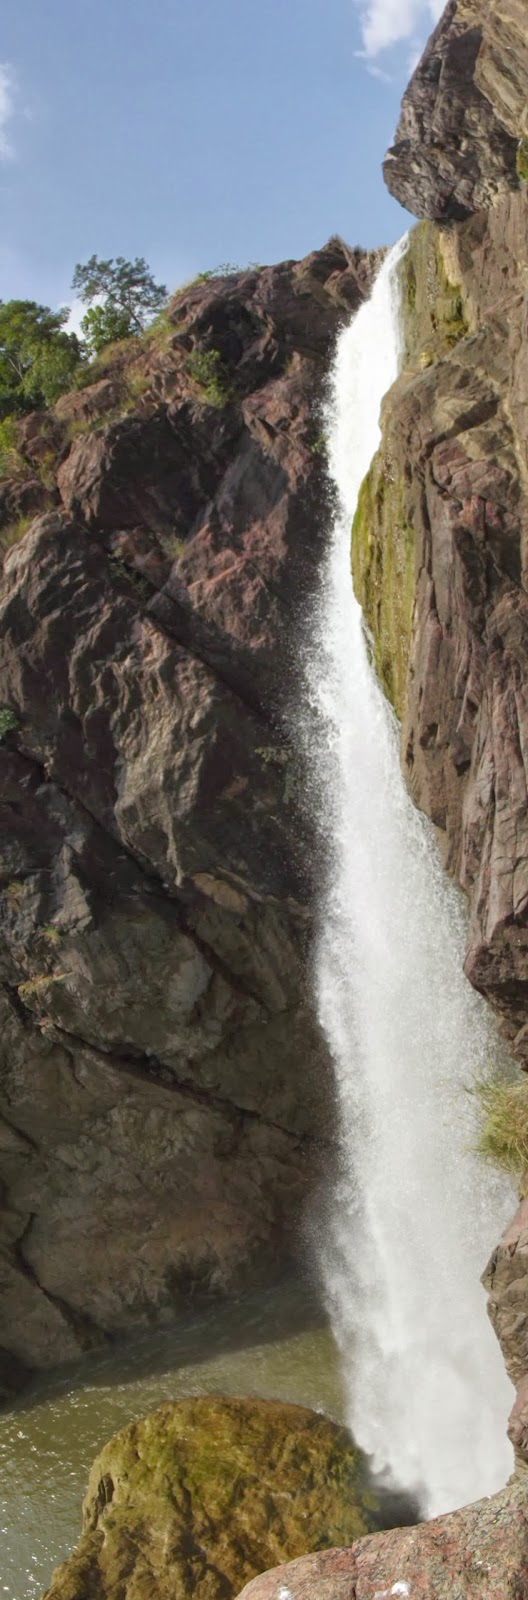 vertical panaroma view of Gayatri Waterfalls